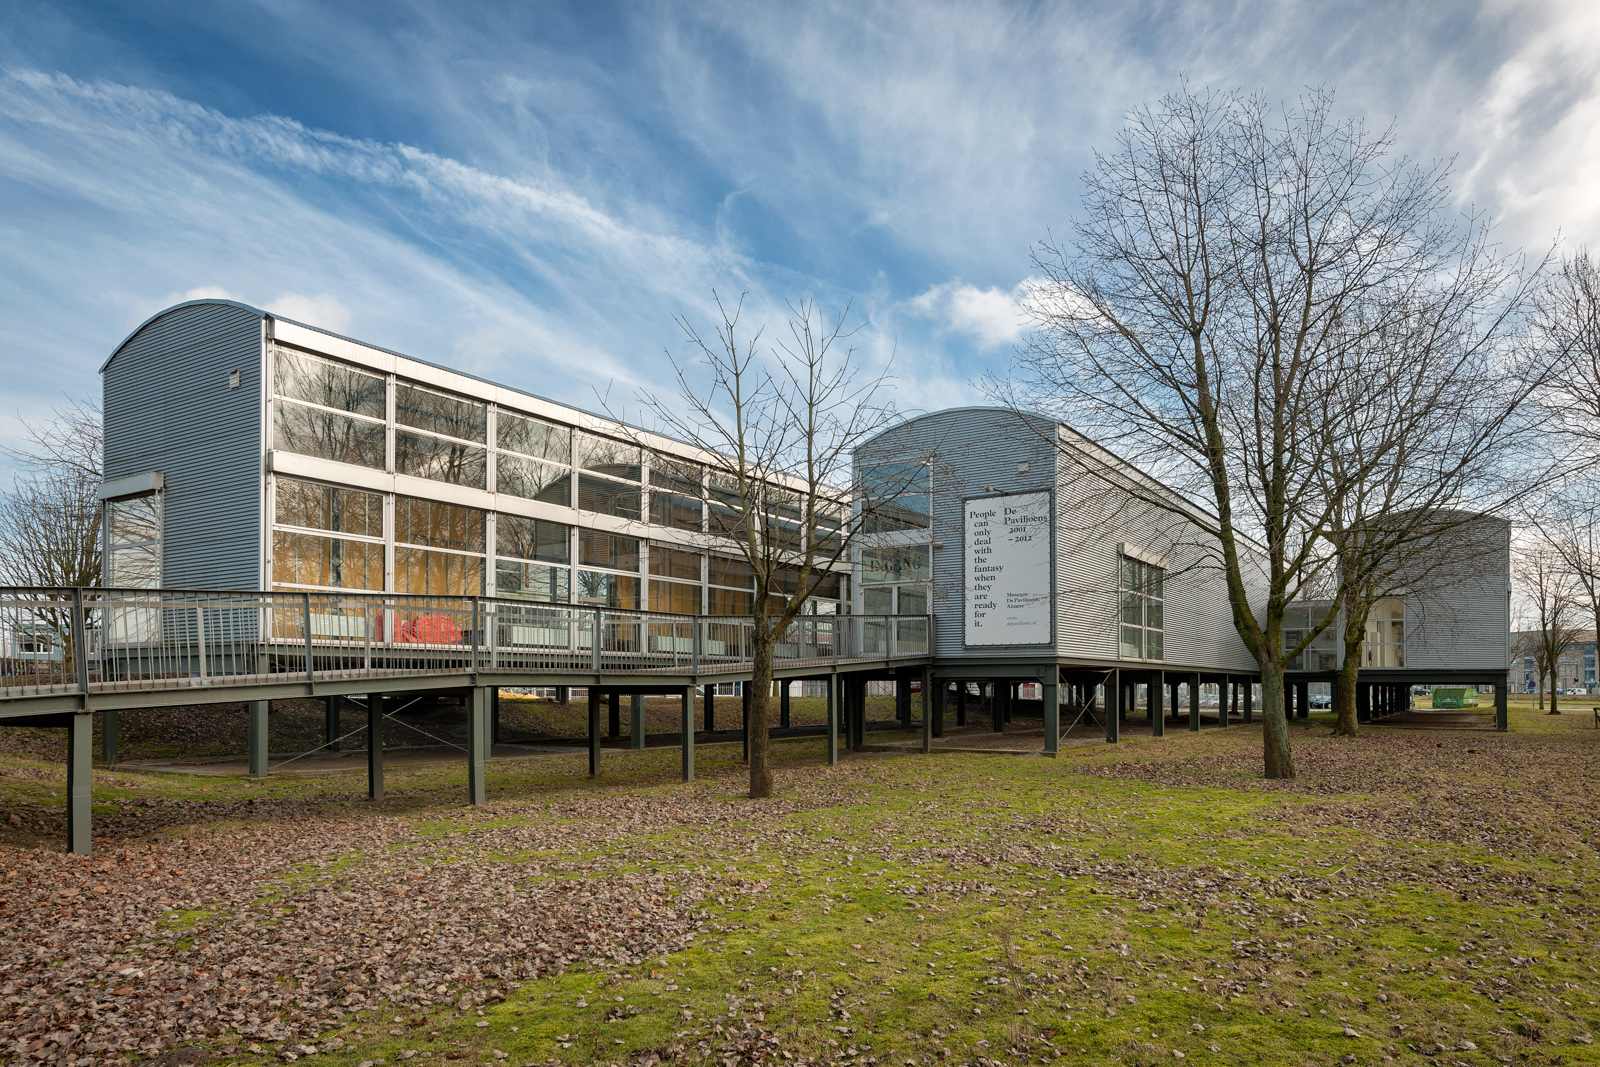 museum de Paviljoens Almere